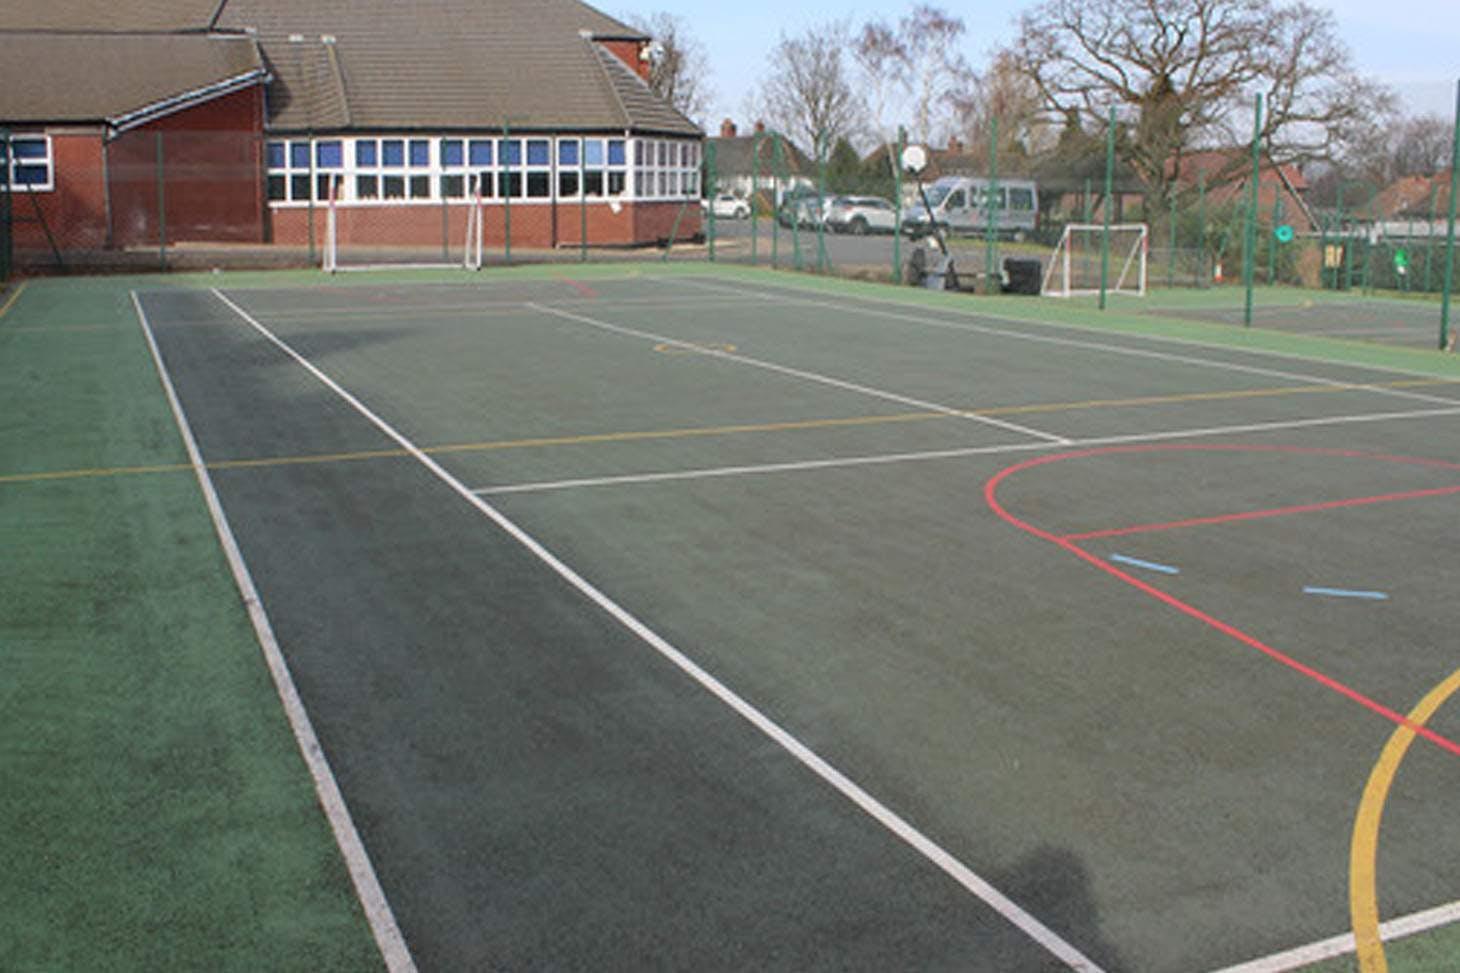 Sutton Coldfield Grammar School for Girls 5 a side   Hard (macadam) football pitch